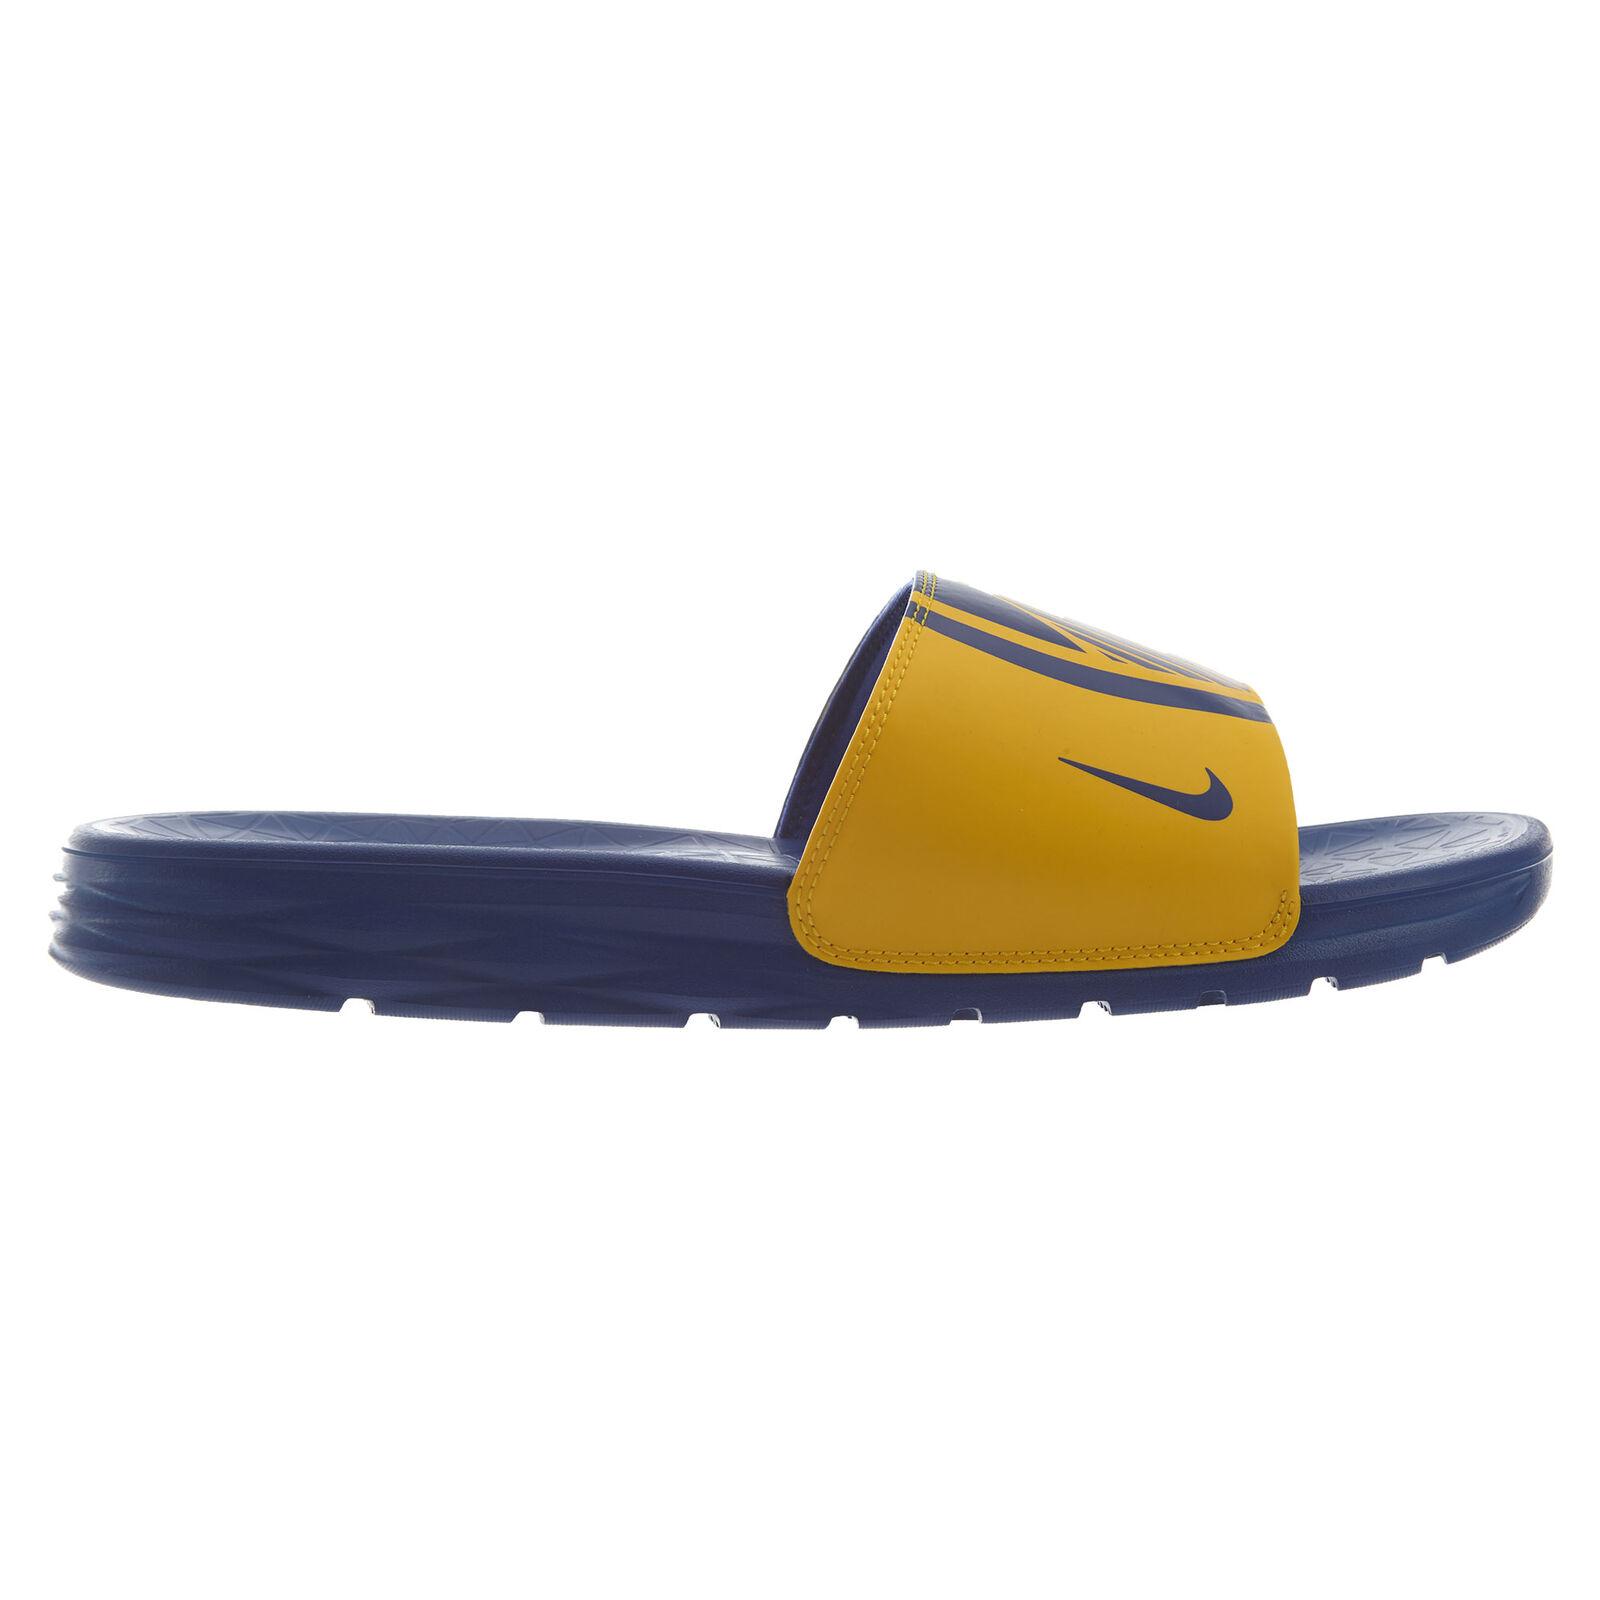 finest selection d9653 bdc31 Nike Benassi Solarsoft NBA Golden State Warriors Slides Size 11 for ...